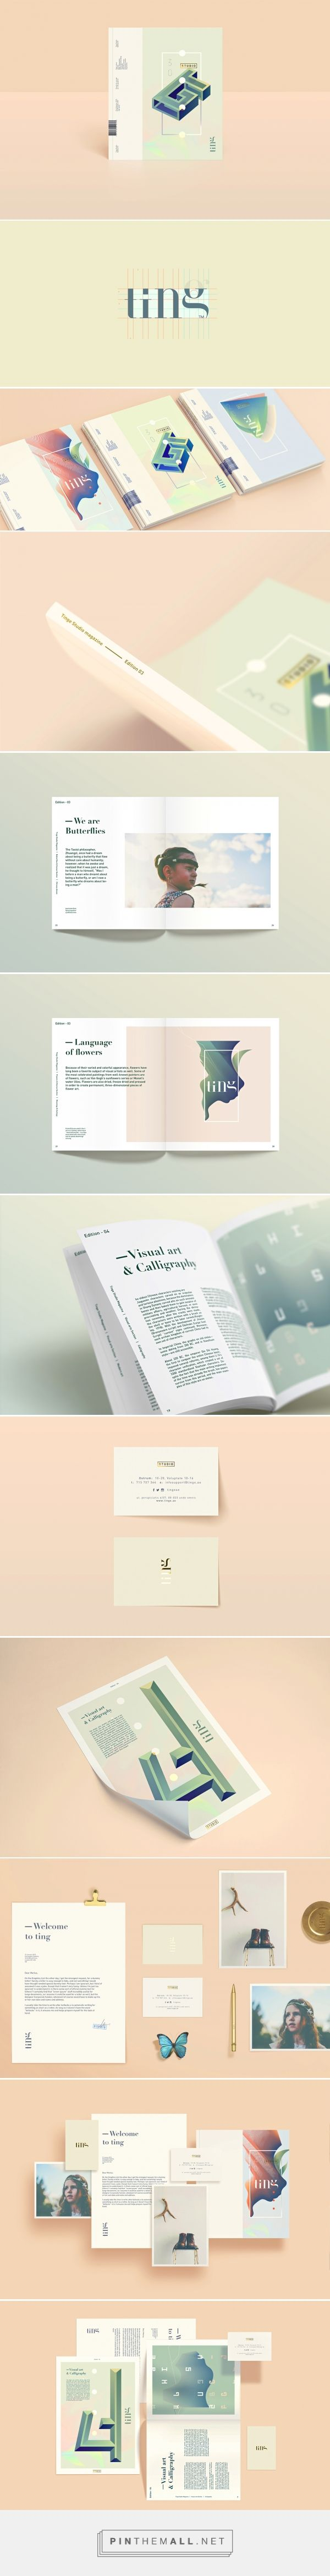 Ting™ — (branding/editorial) on Behance - created via http://pinthemall.net